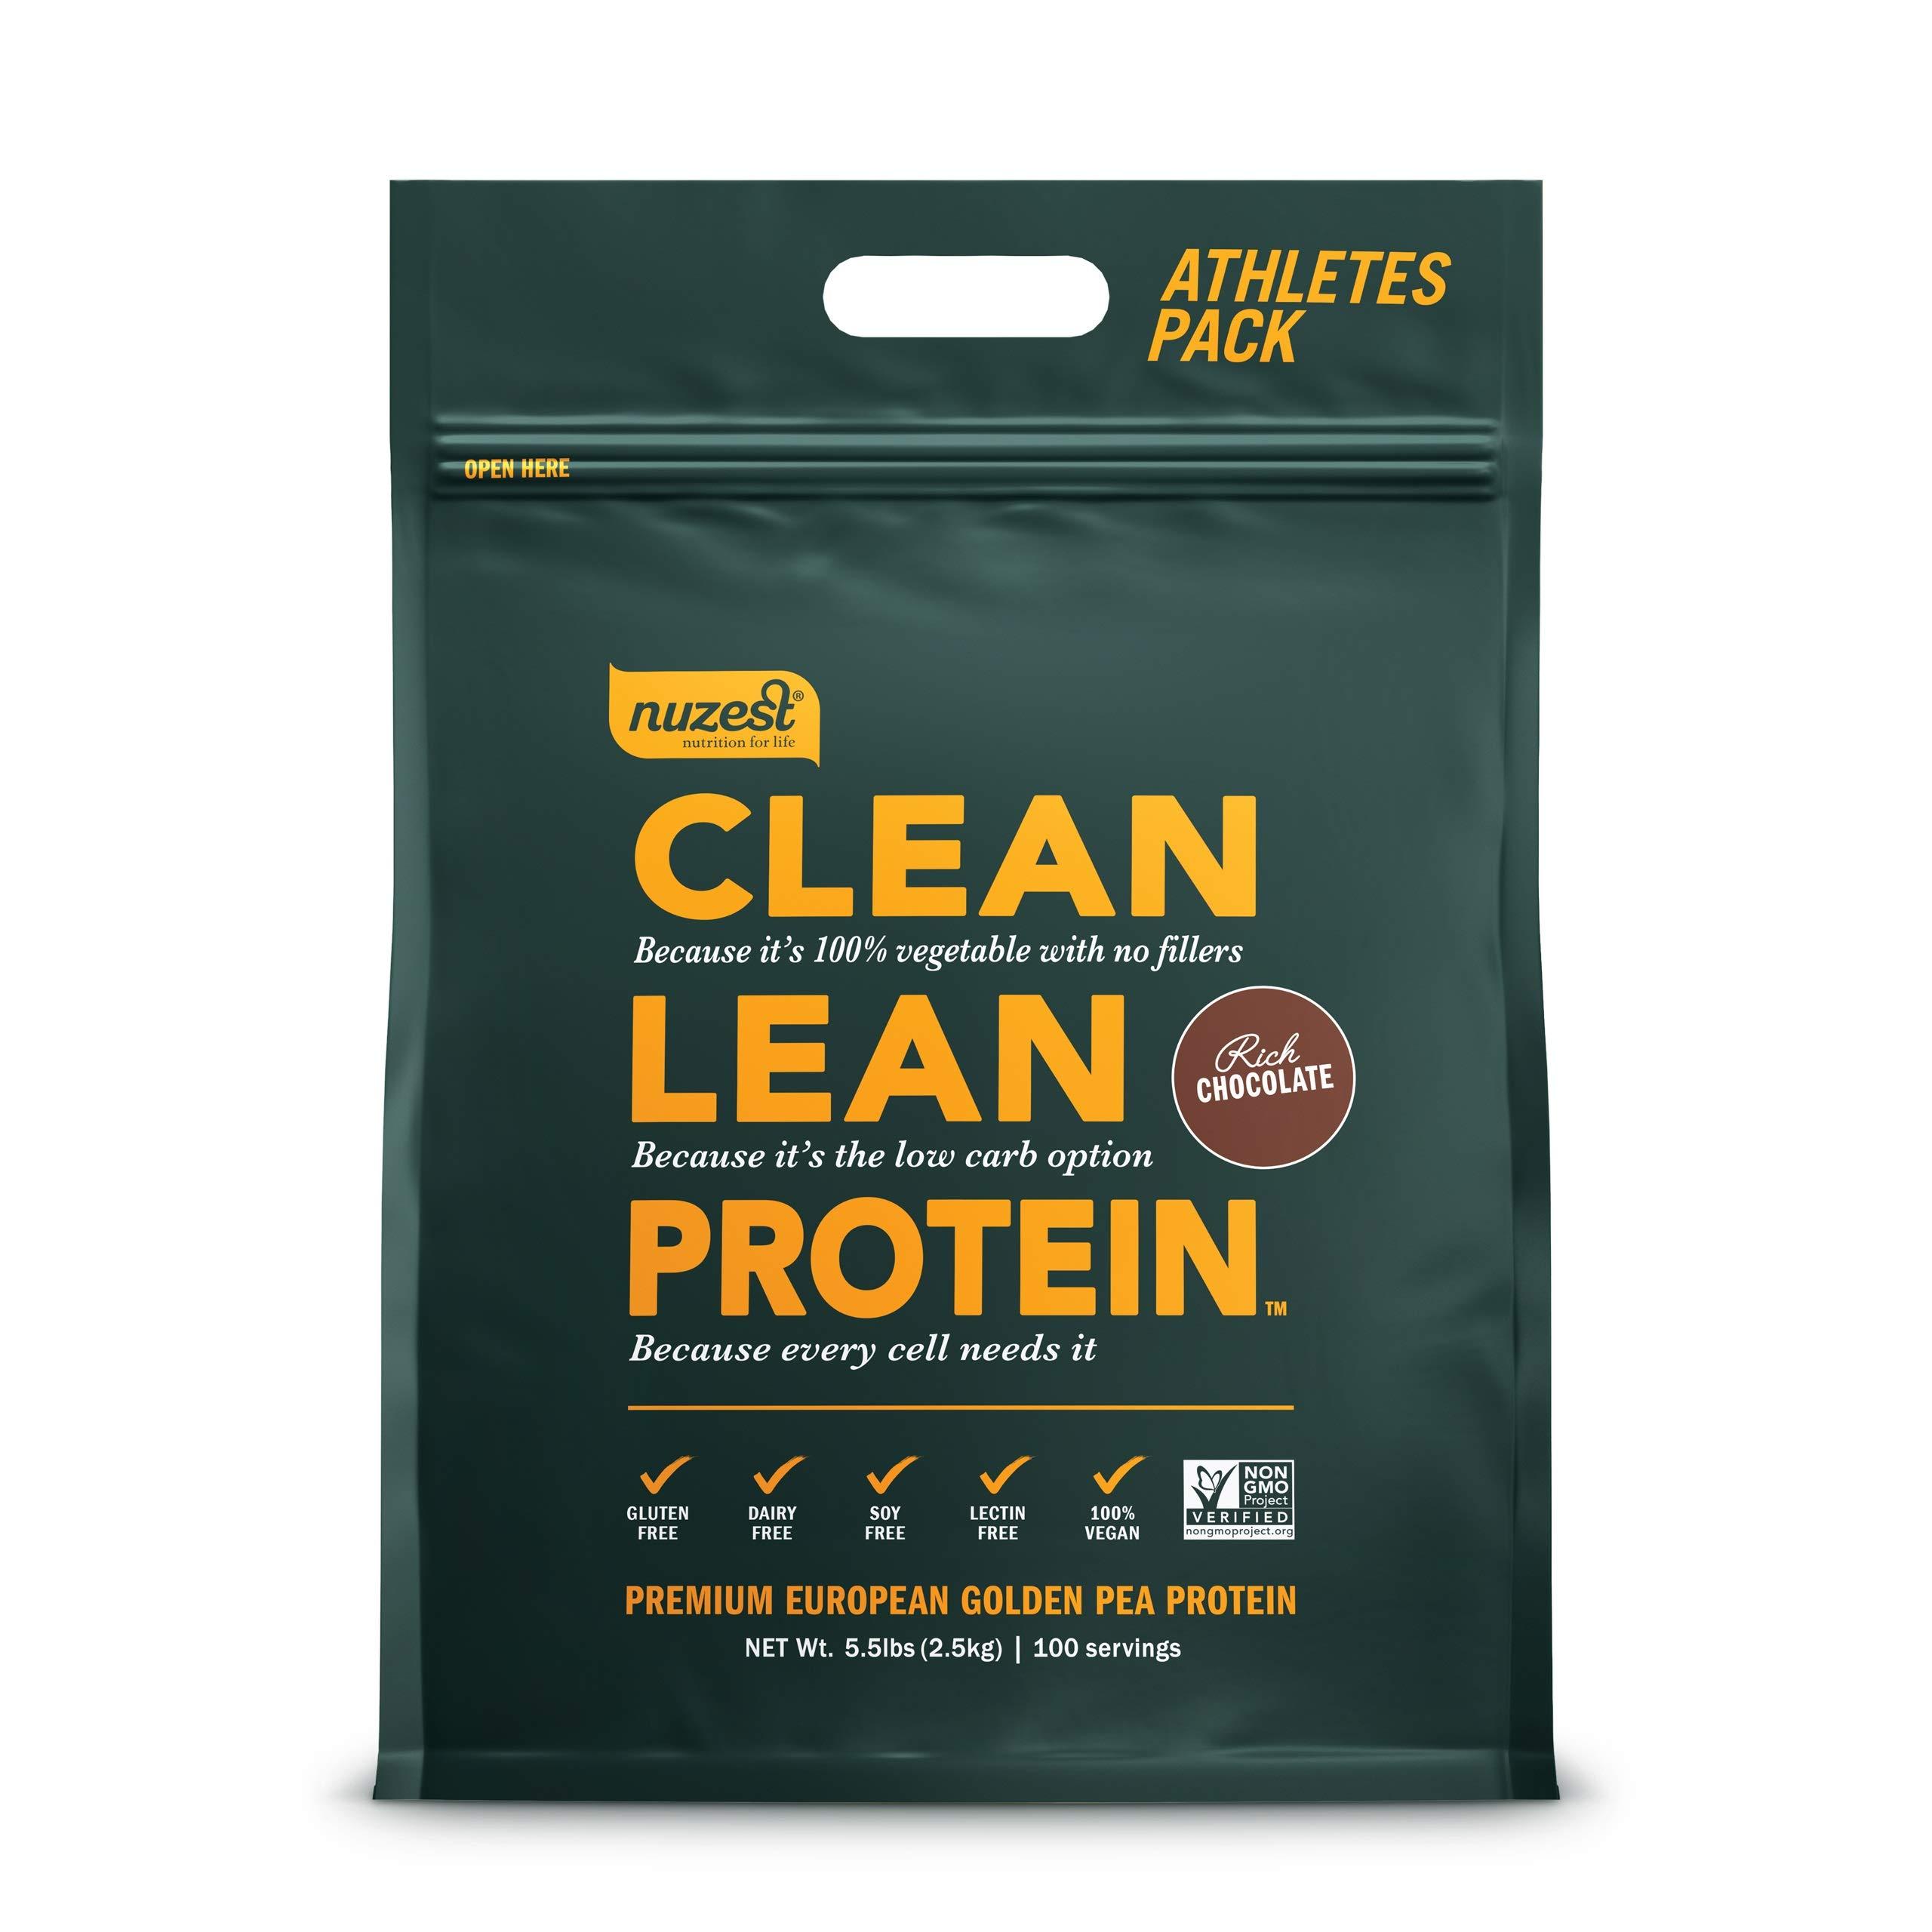 Nuzest Clean Lean Protein - Premium Vegan Protein Powder, Plant Protein Powder, European Golden Pea Protein, Dairy Free, Gluten Free, GMO Free, Naturally Sweetened, Rich Chocolate, 100 Servings, 5.5lb by NuZest